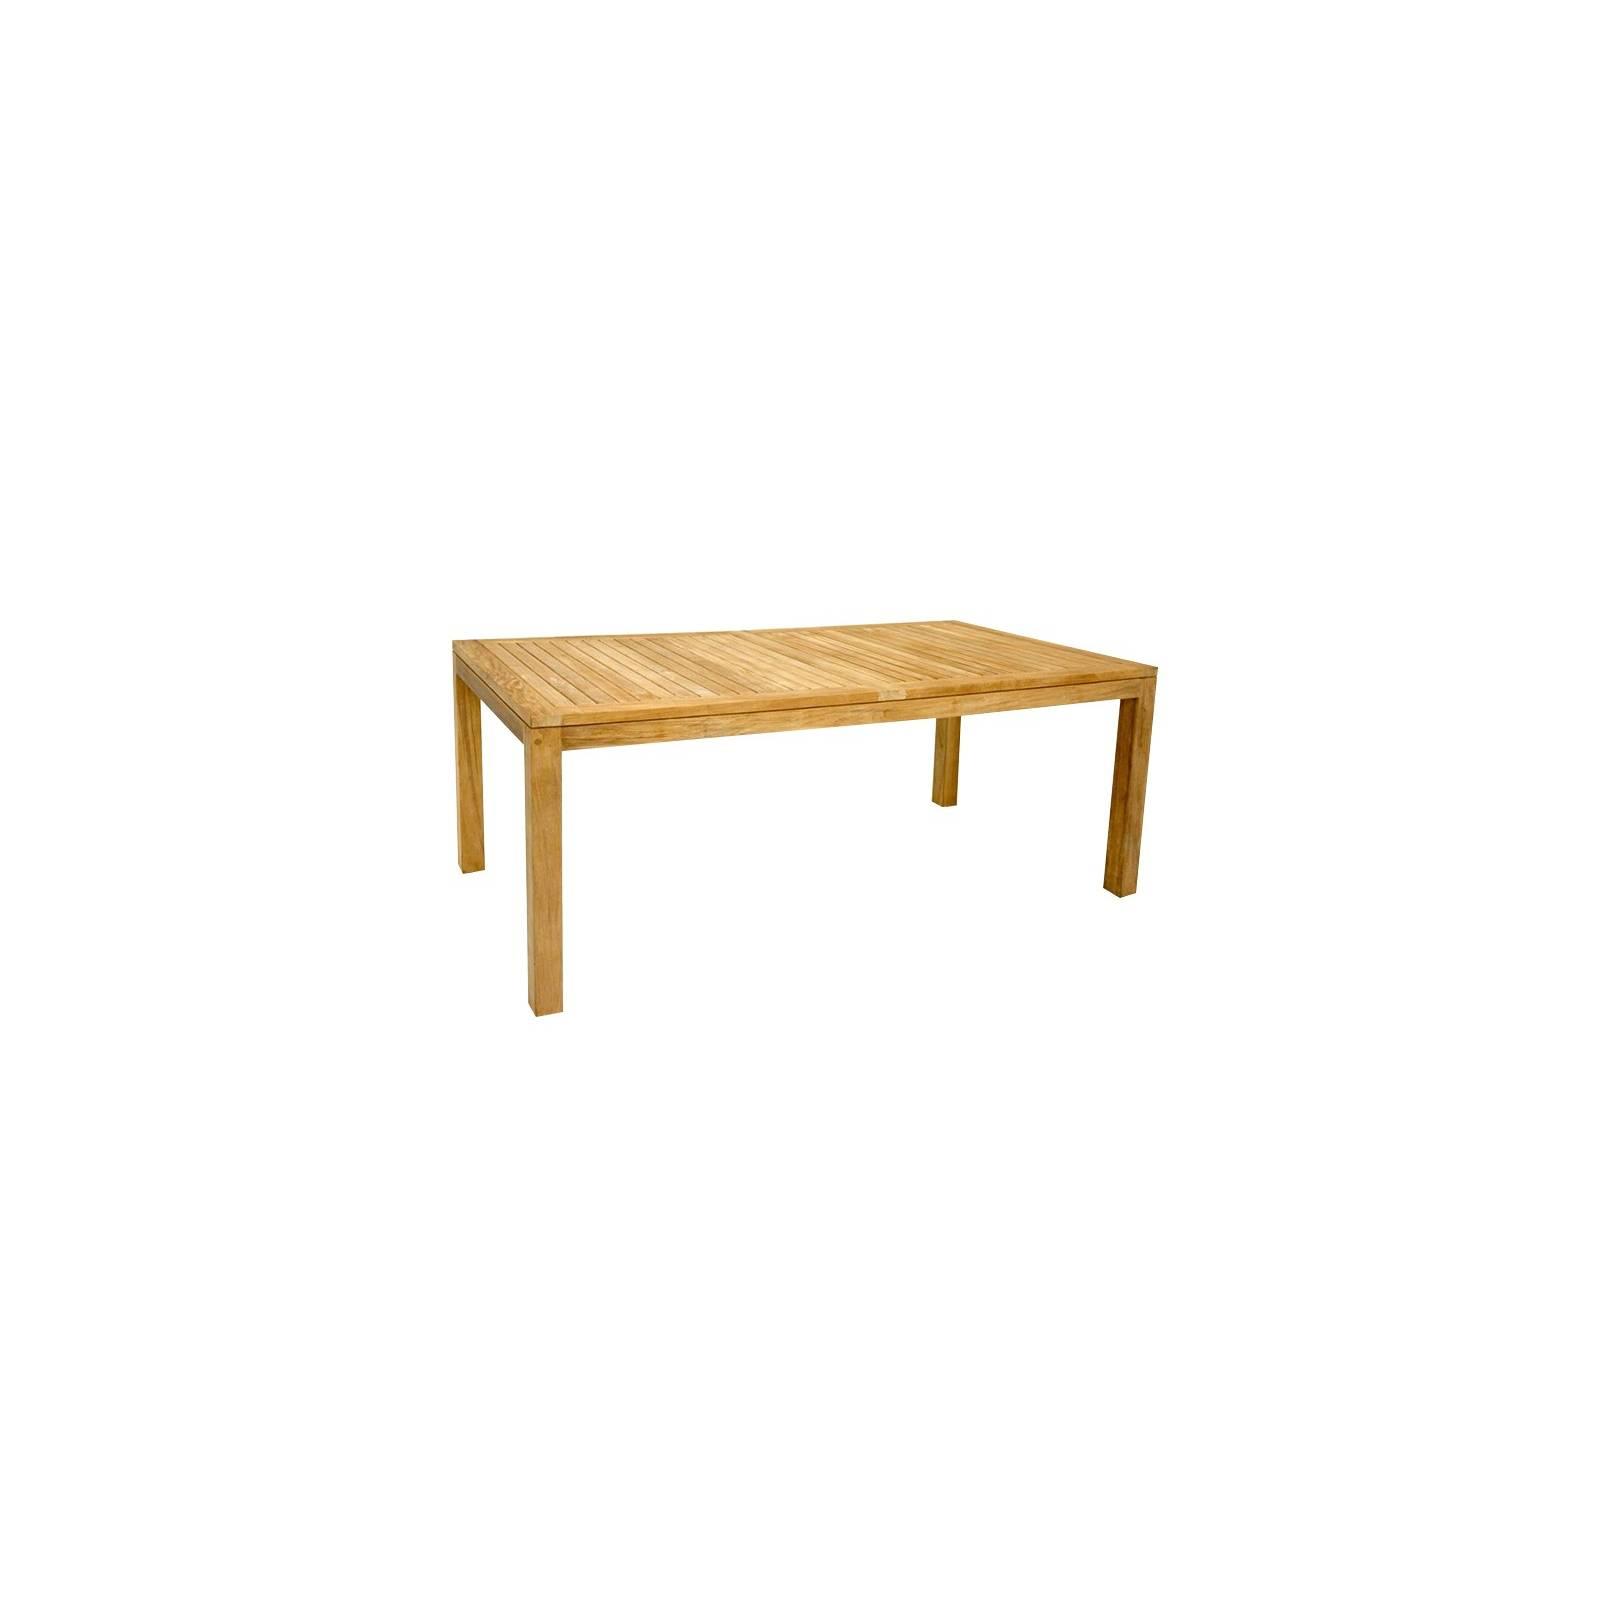 Table De Repas Rectangulaire Taman Teck Recyclé - meuble de jardin